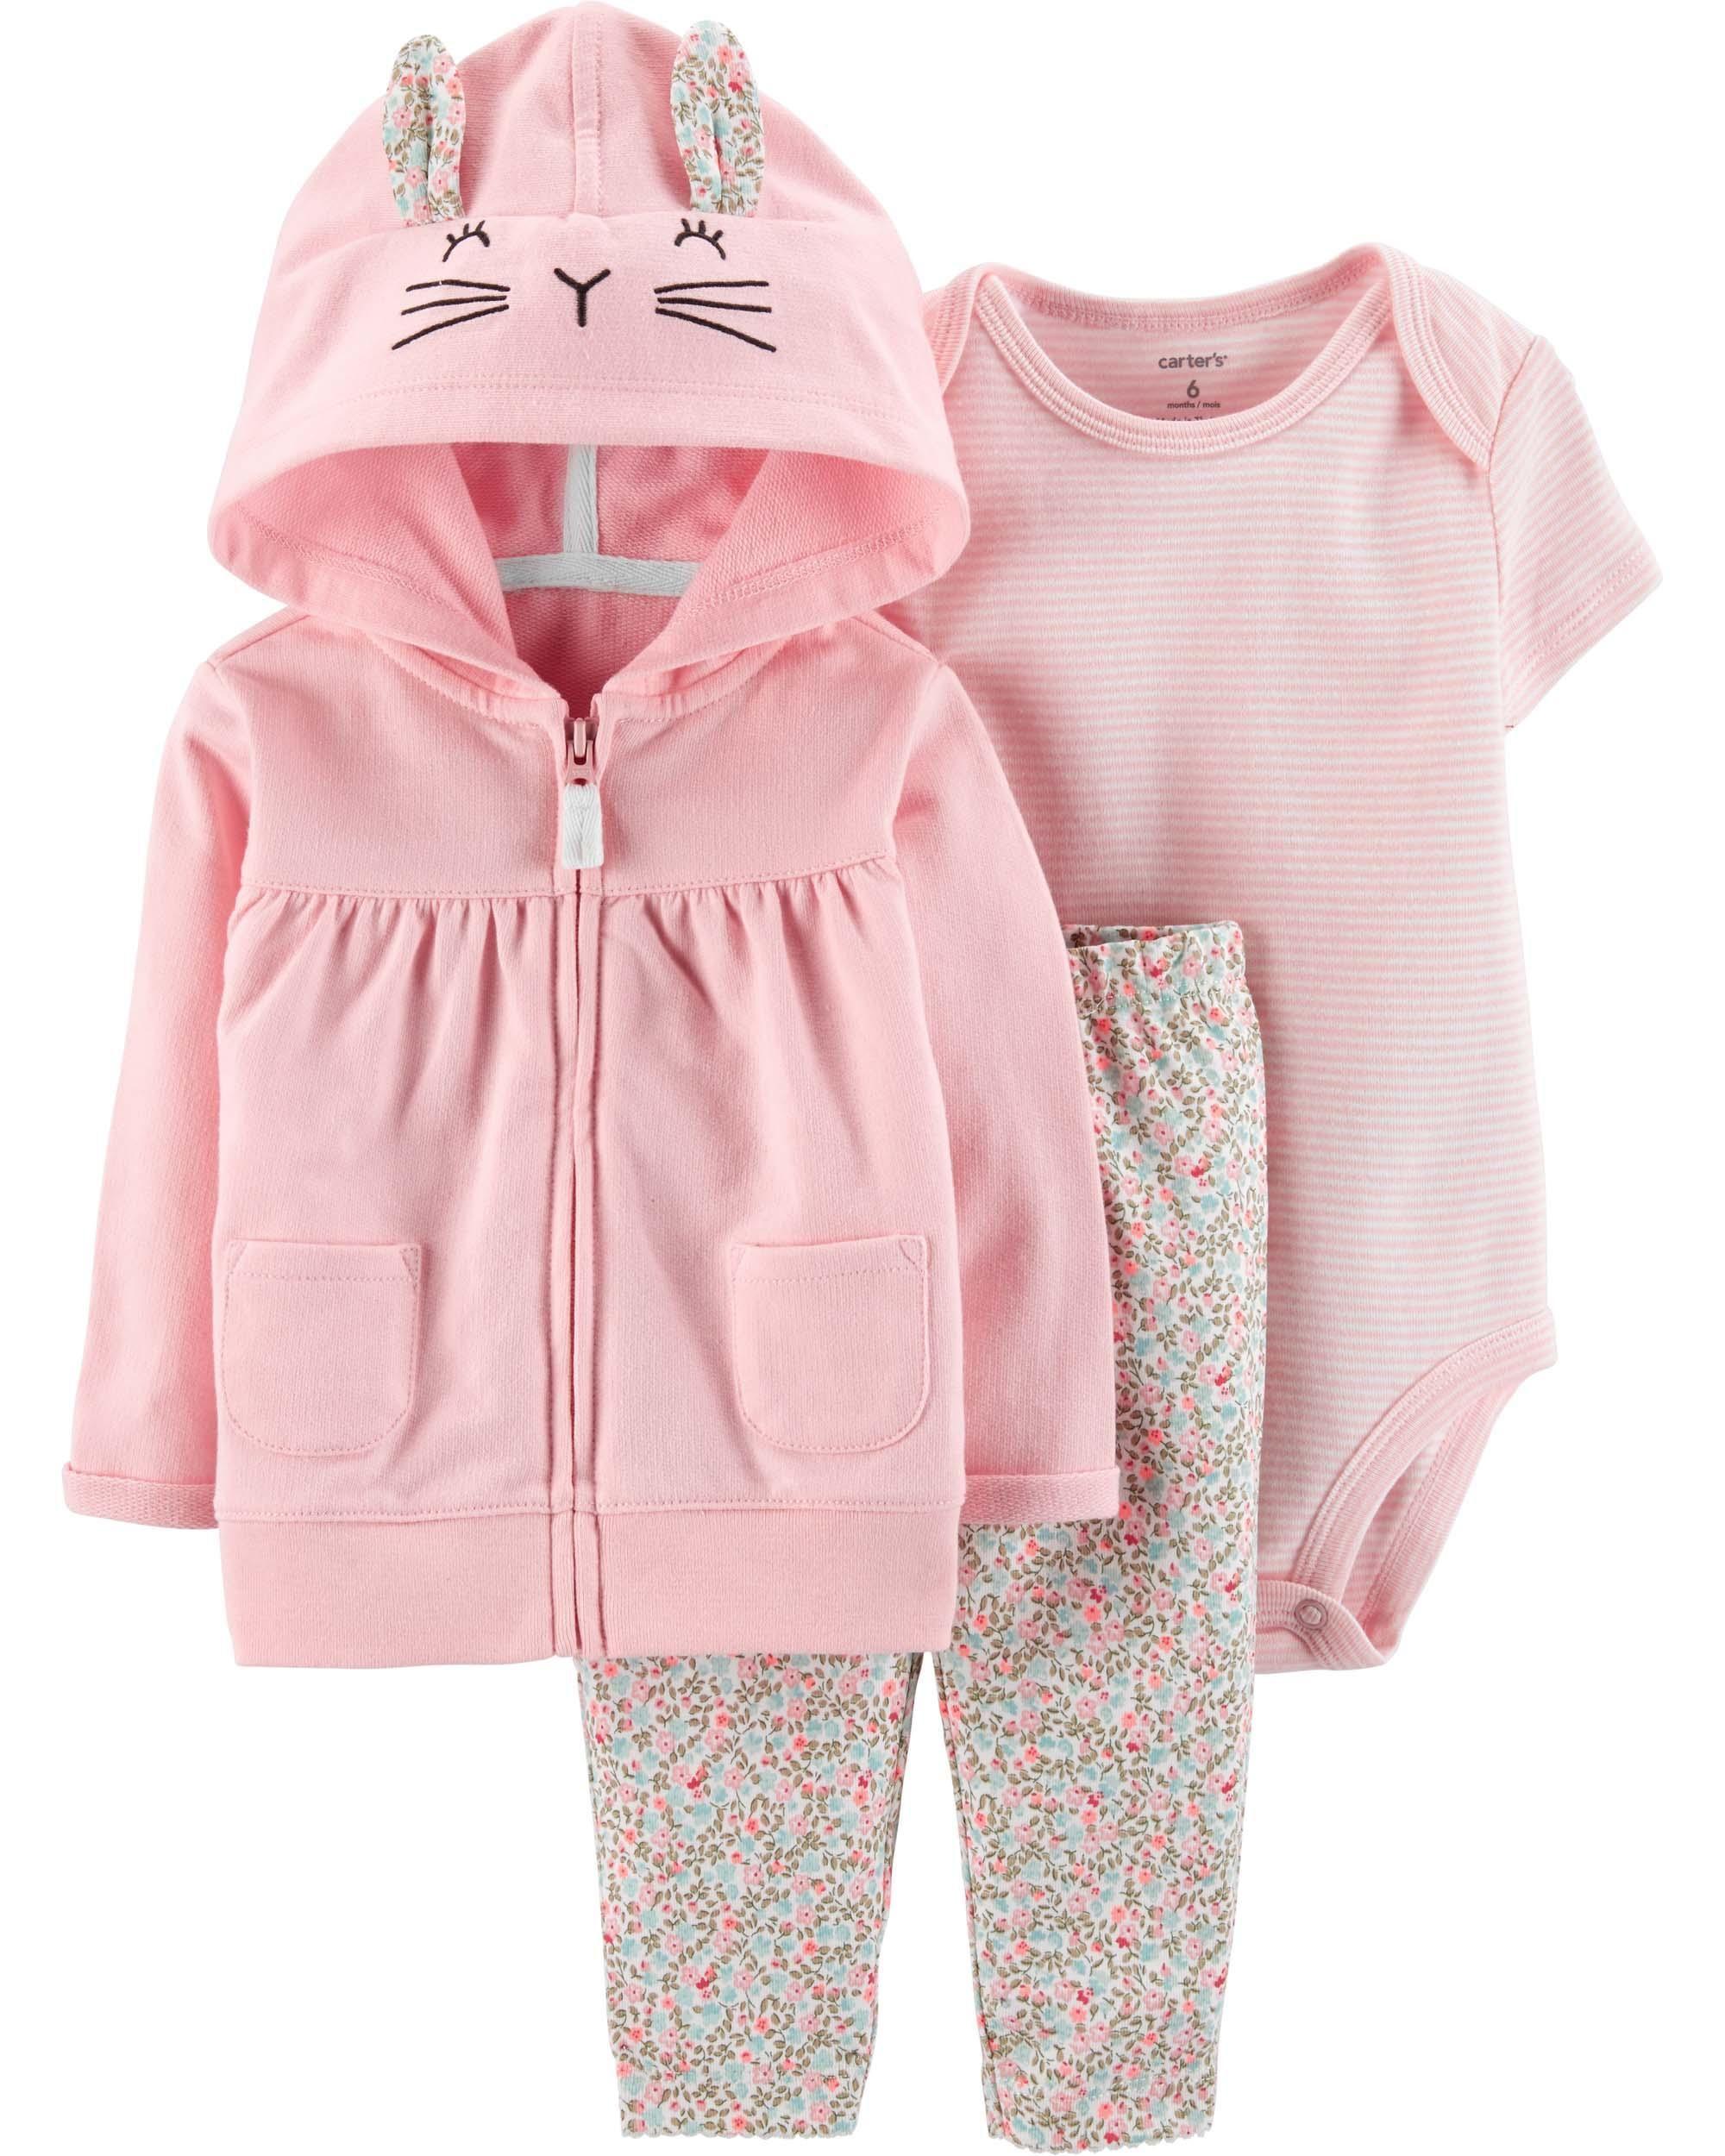 9e1de8e40 3-Piece Little Jacket Set | Things I love | Pinterest | Baby ...